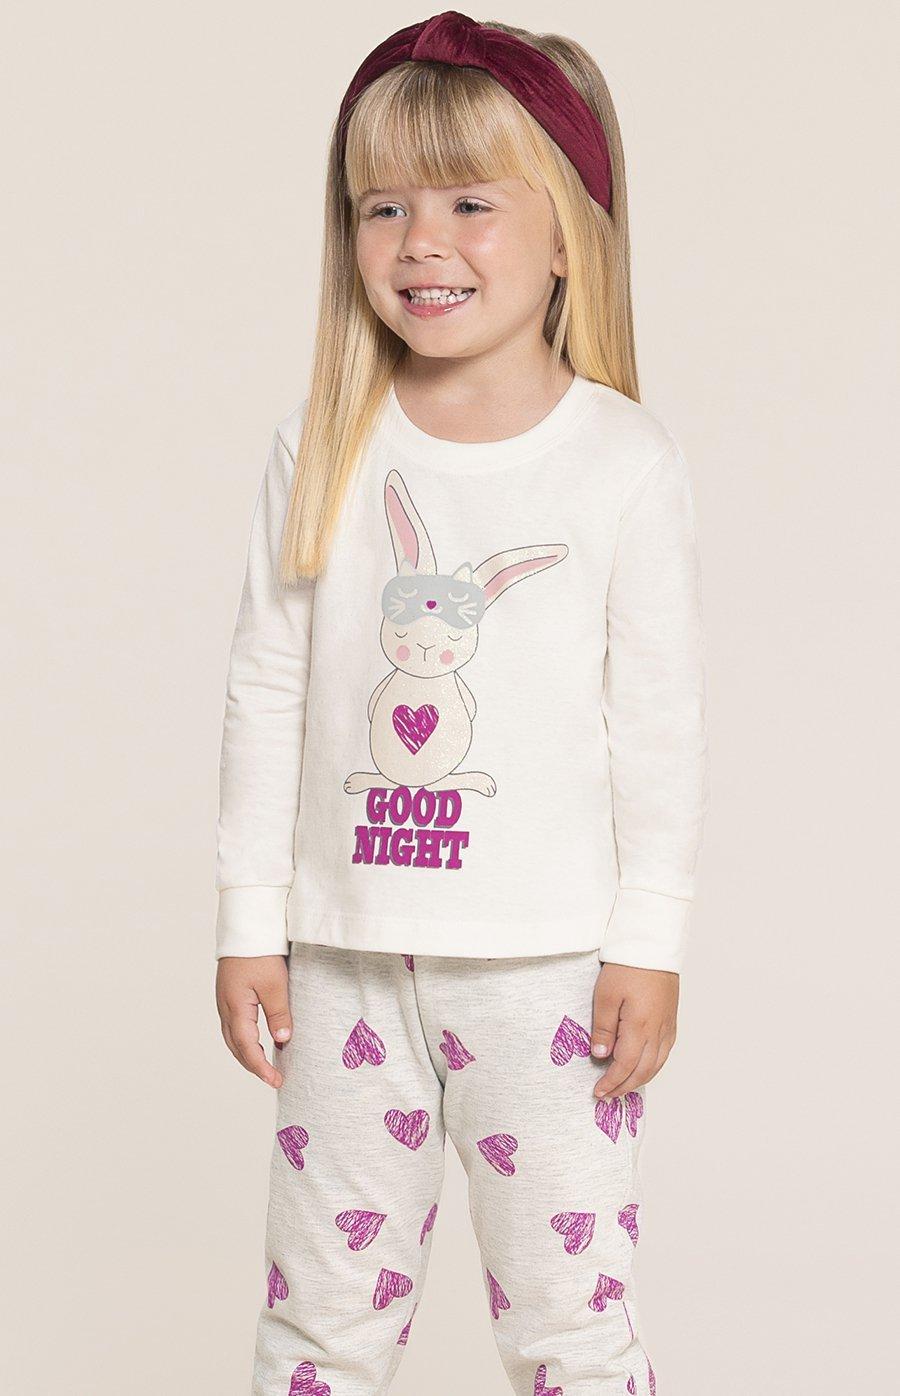 Pijama Baby 1/2 Malha Good Night Inverno 2020 SWEET STORIES